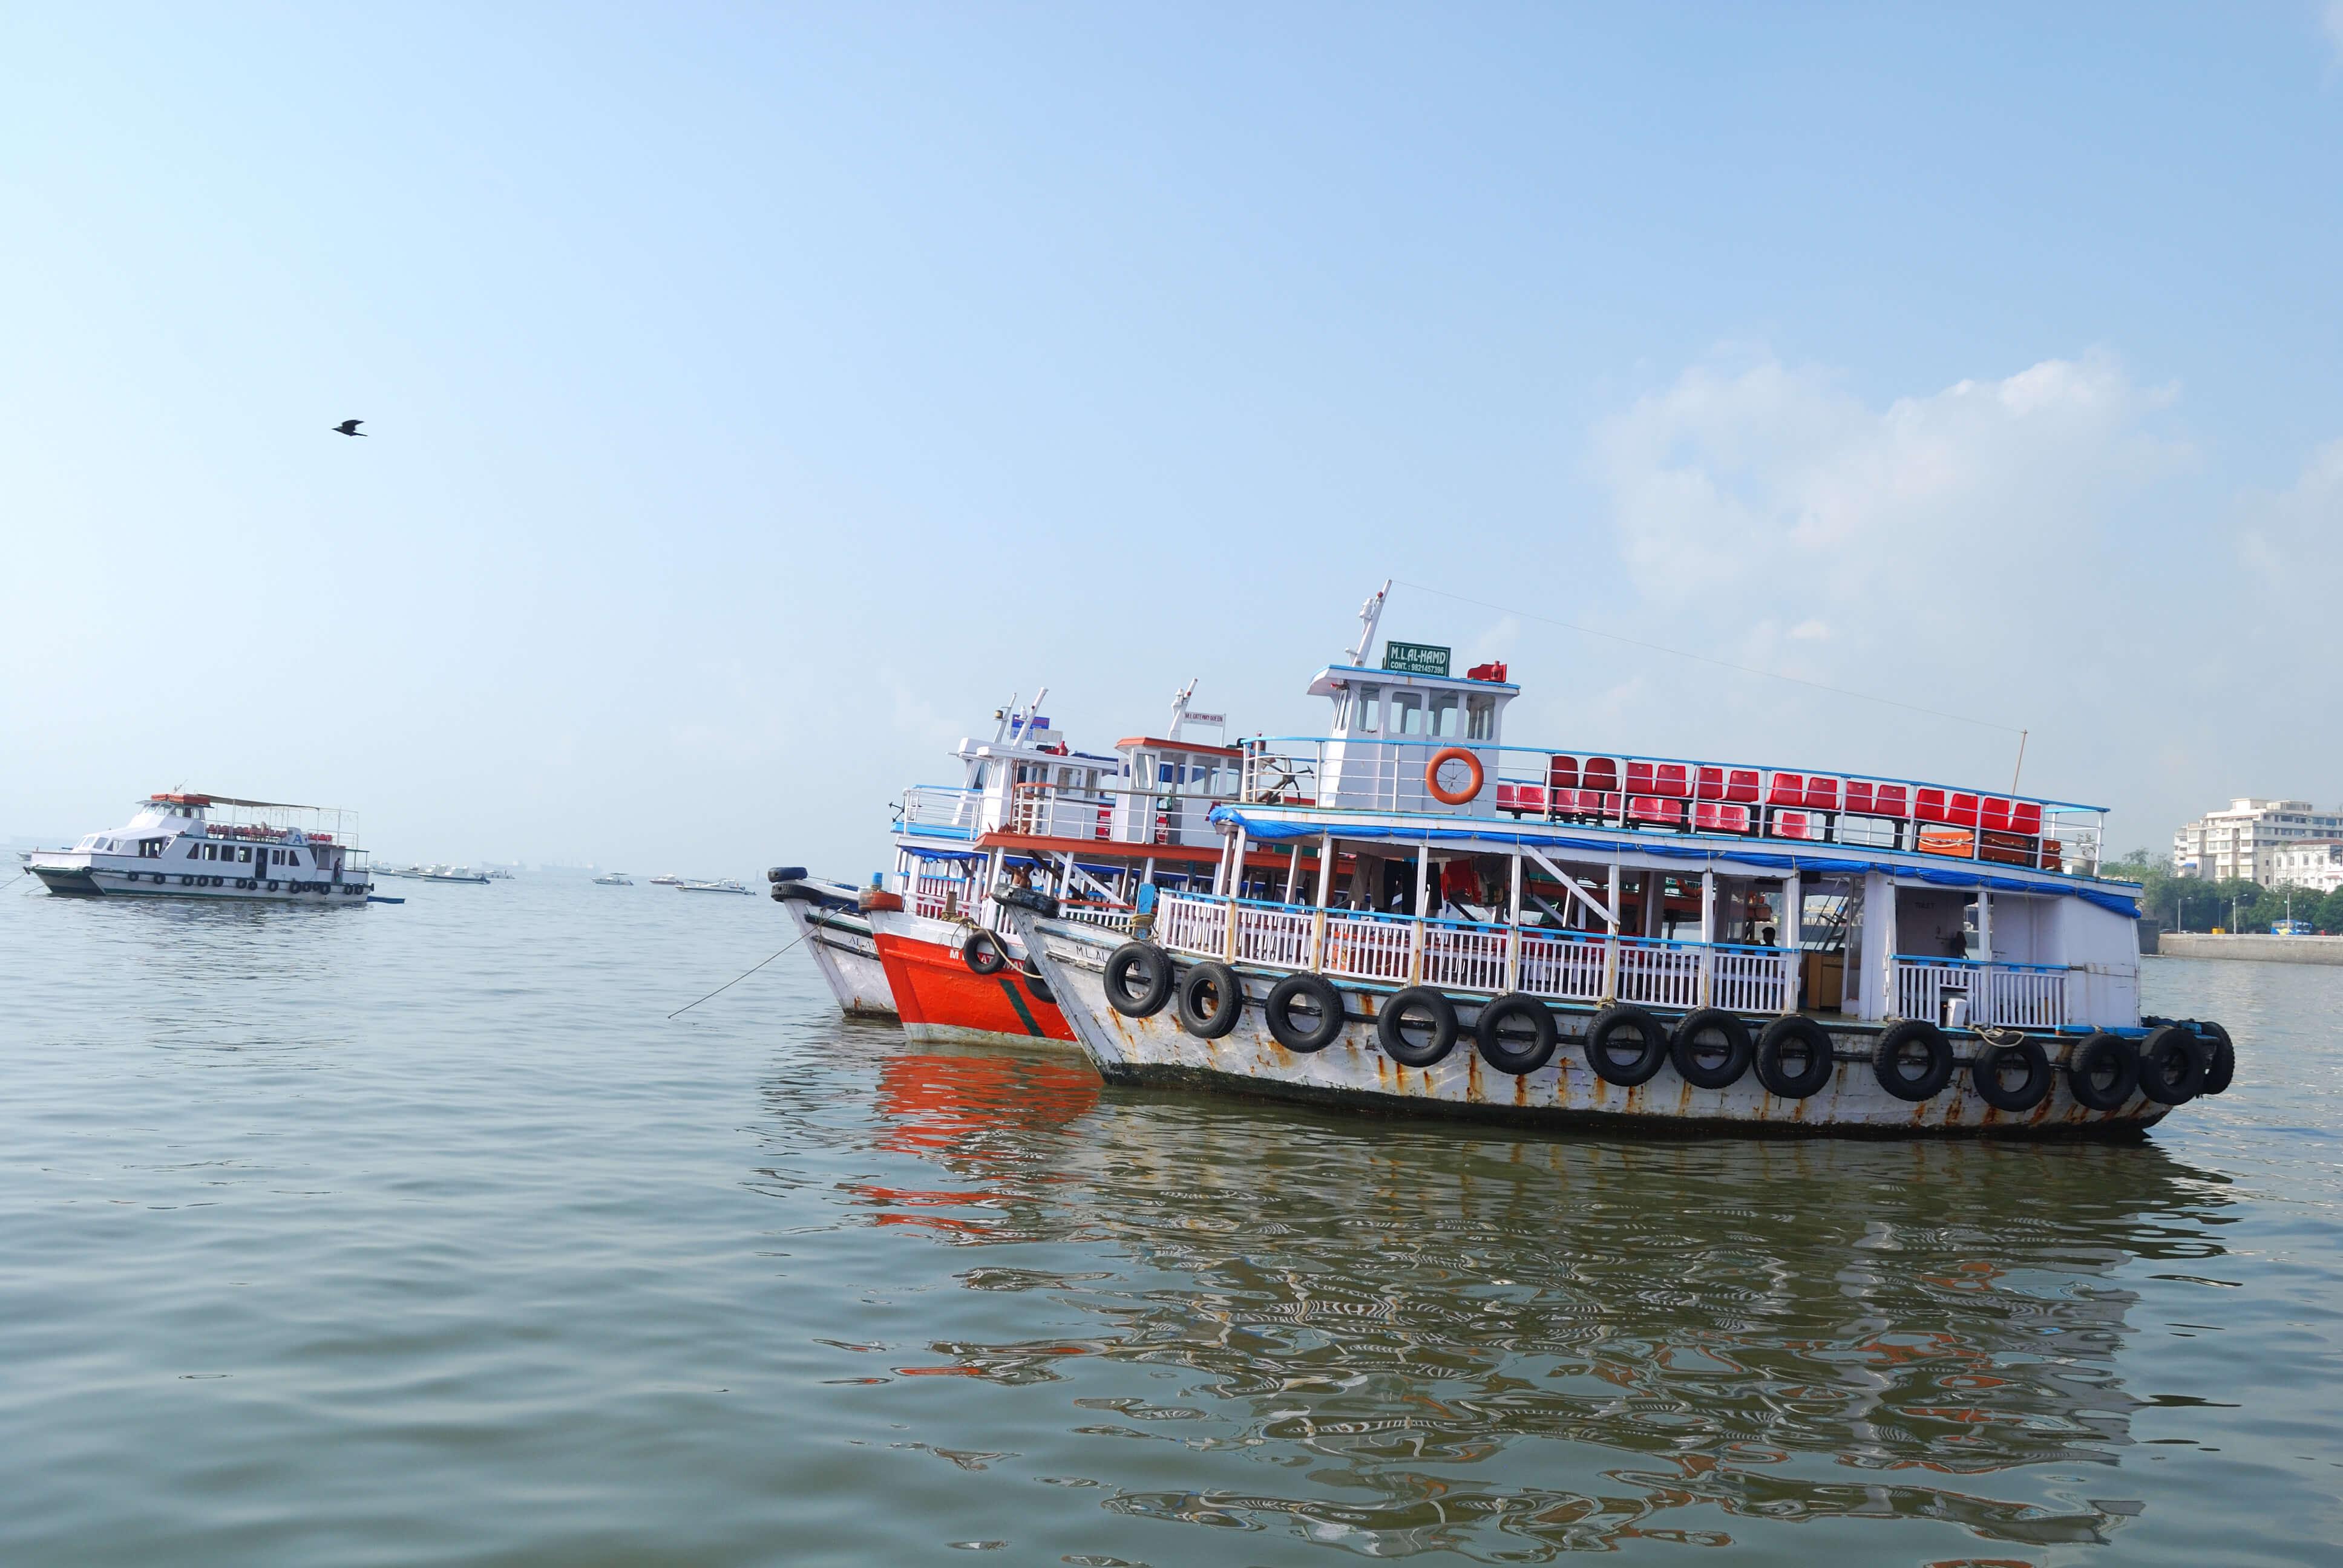 A Ferry in Mumbai